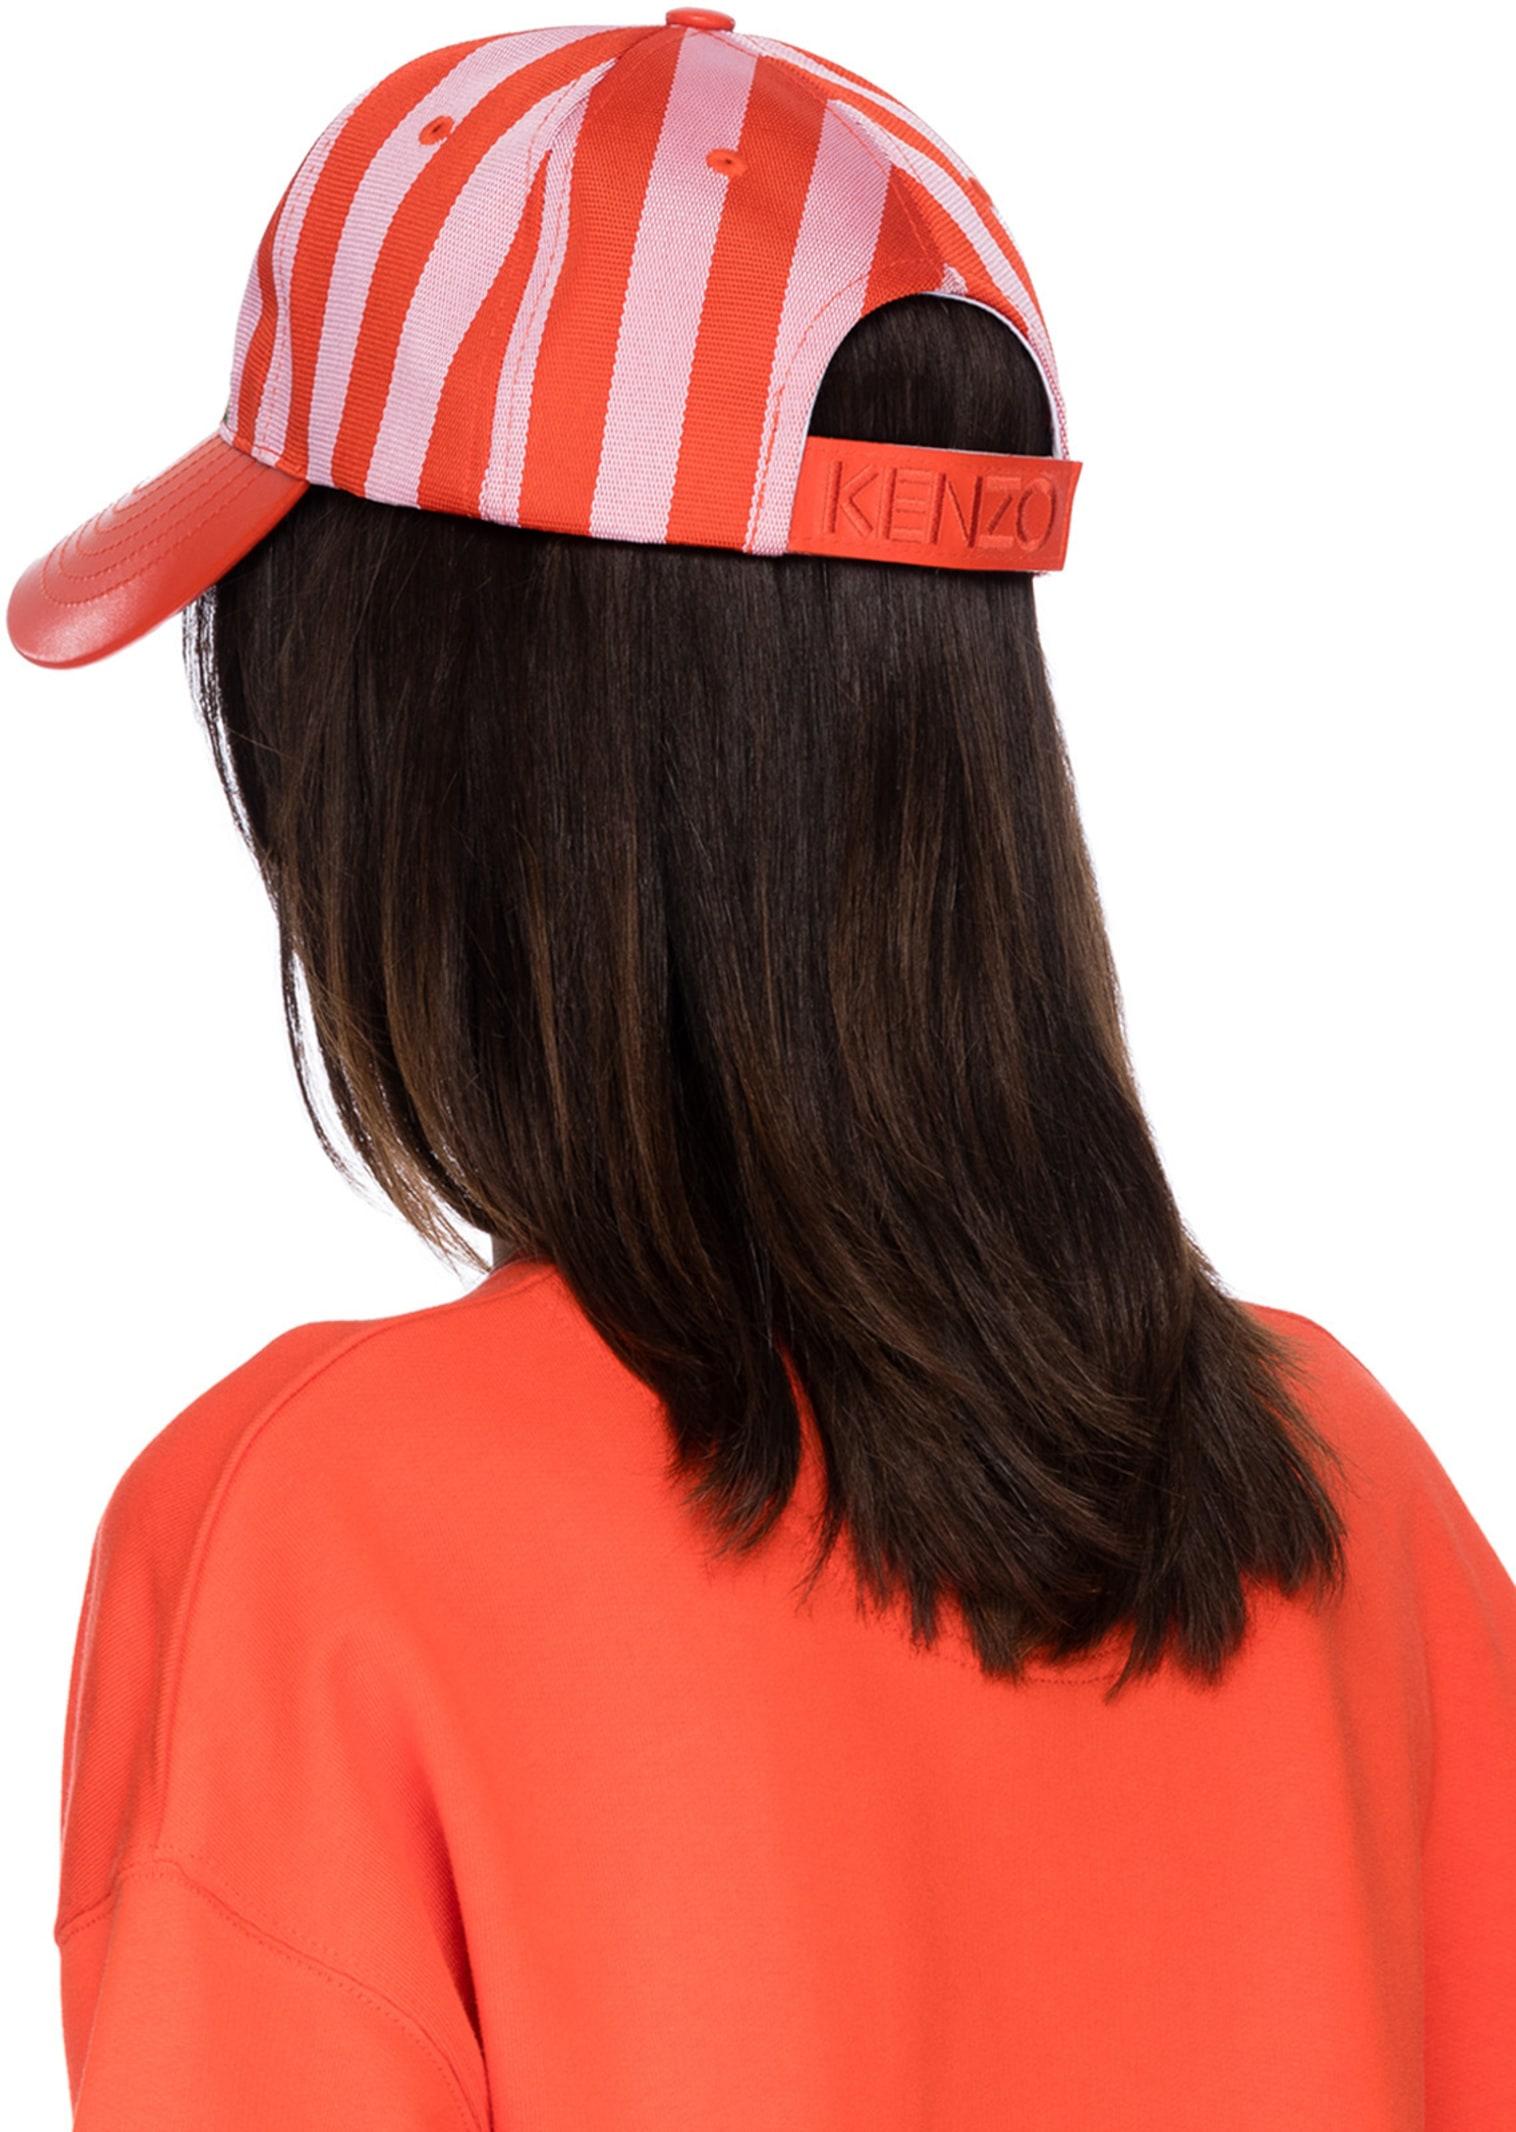 4c261c8ebb764 Kenzo: Stripe Tiger Canvas Cap - Flamingo Pink | influenceu